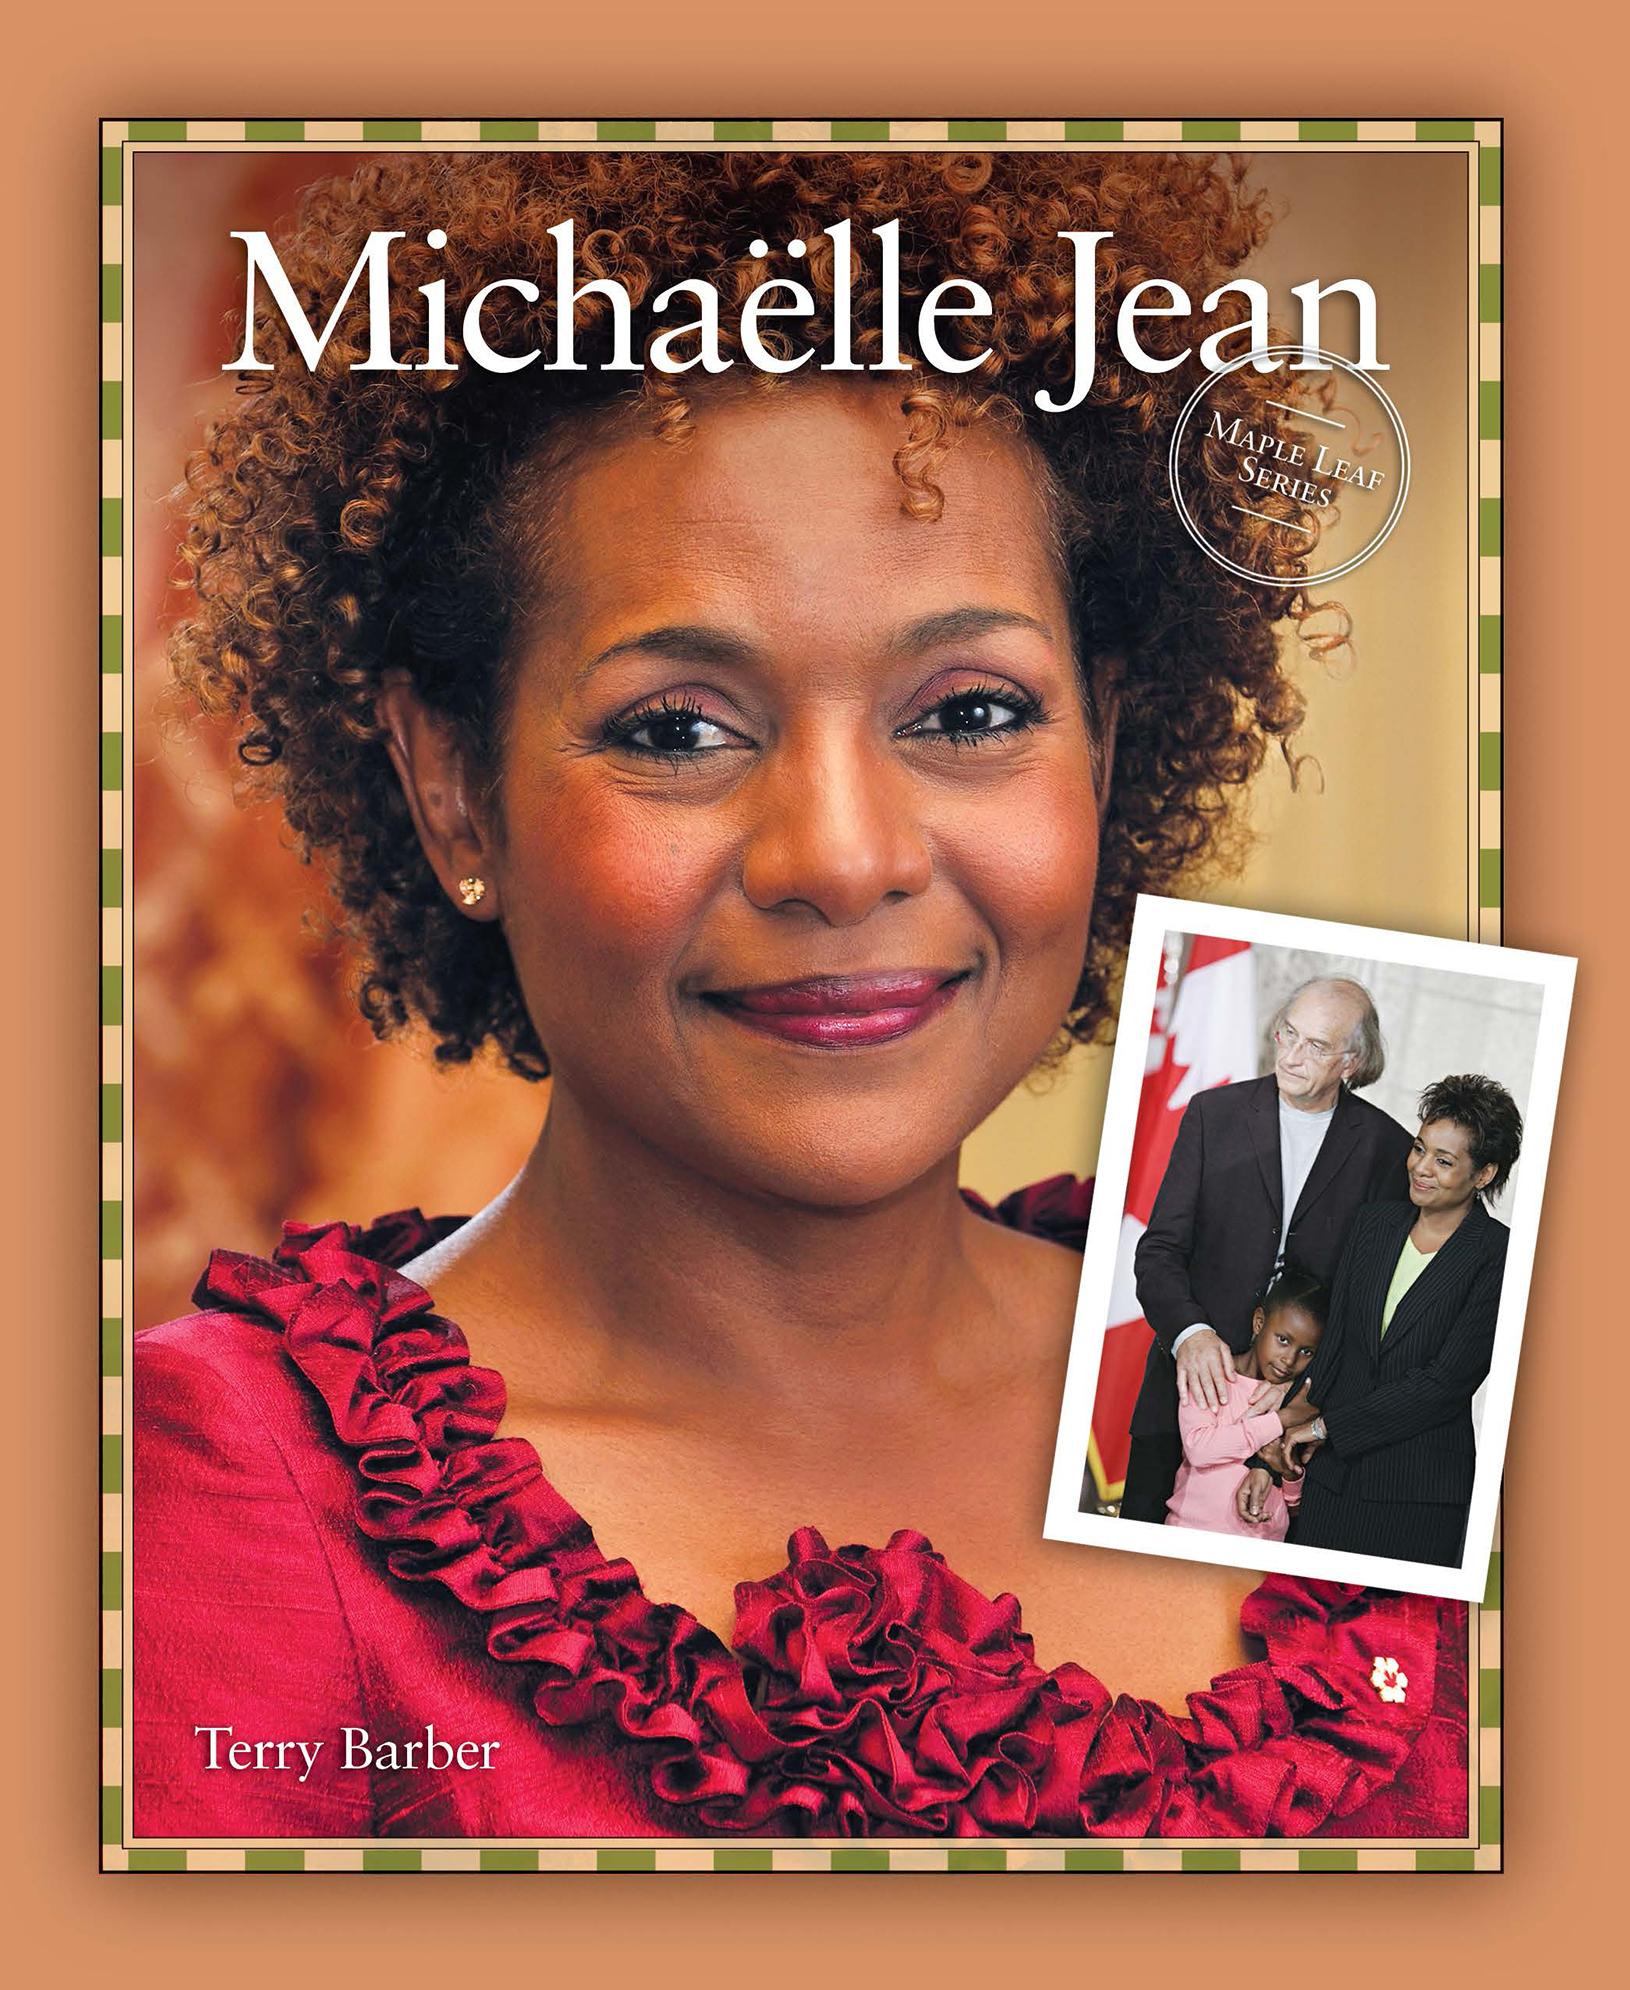 Michaelle Jean